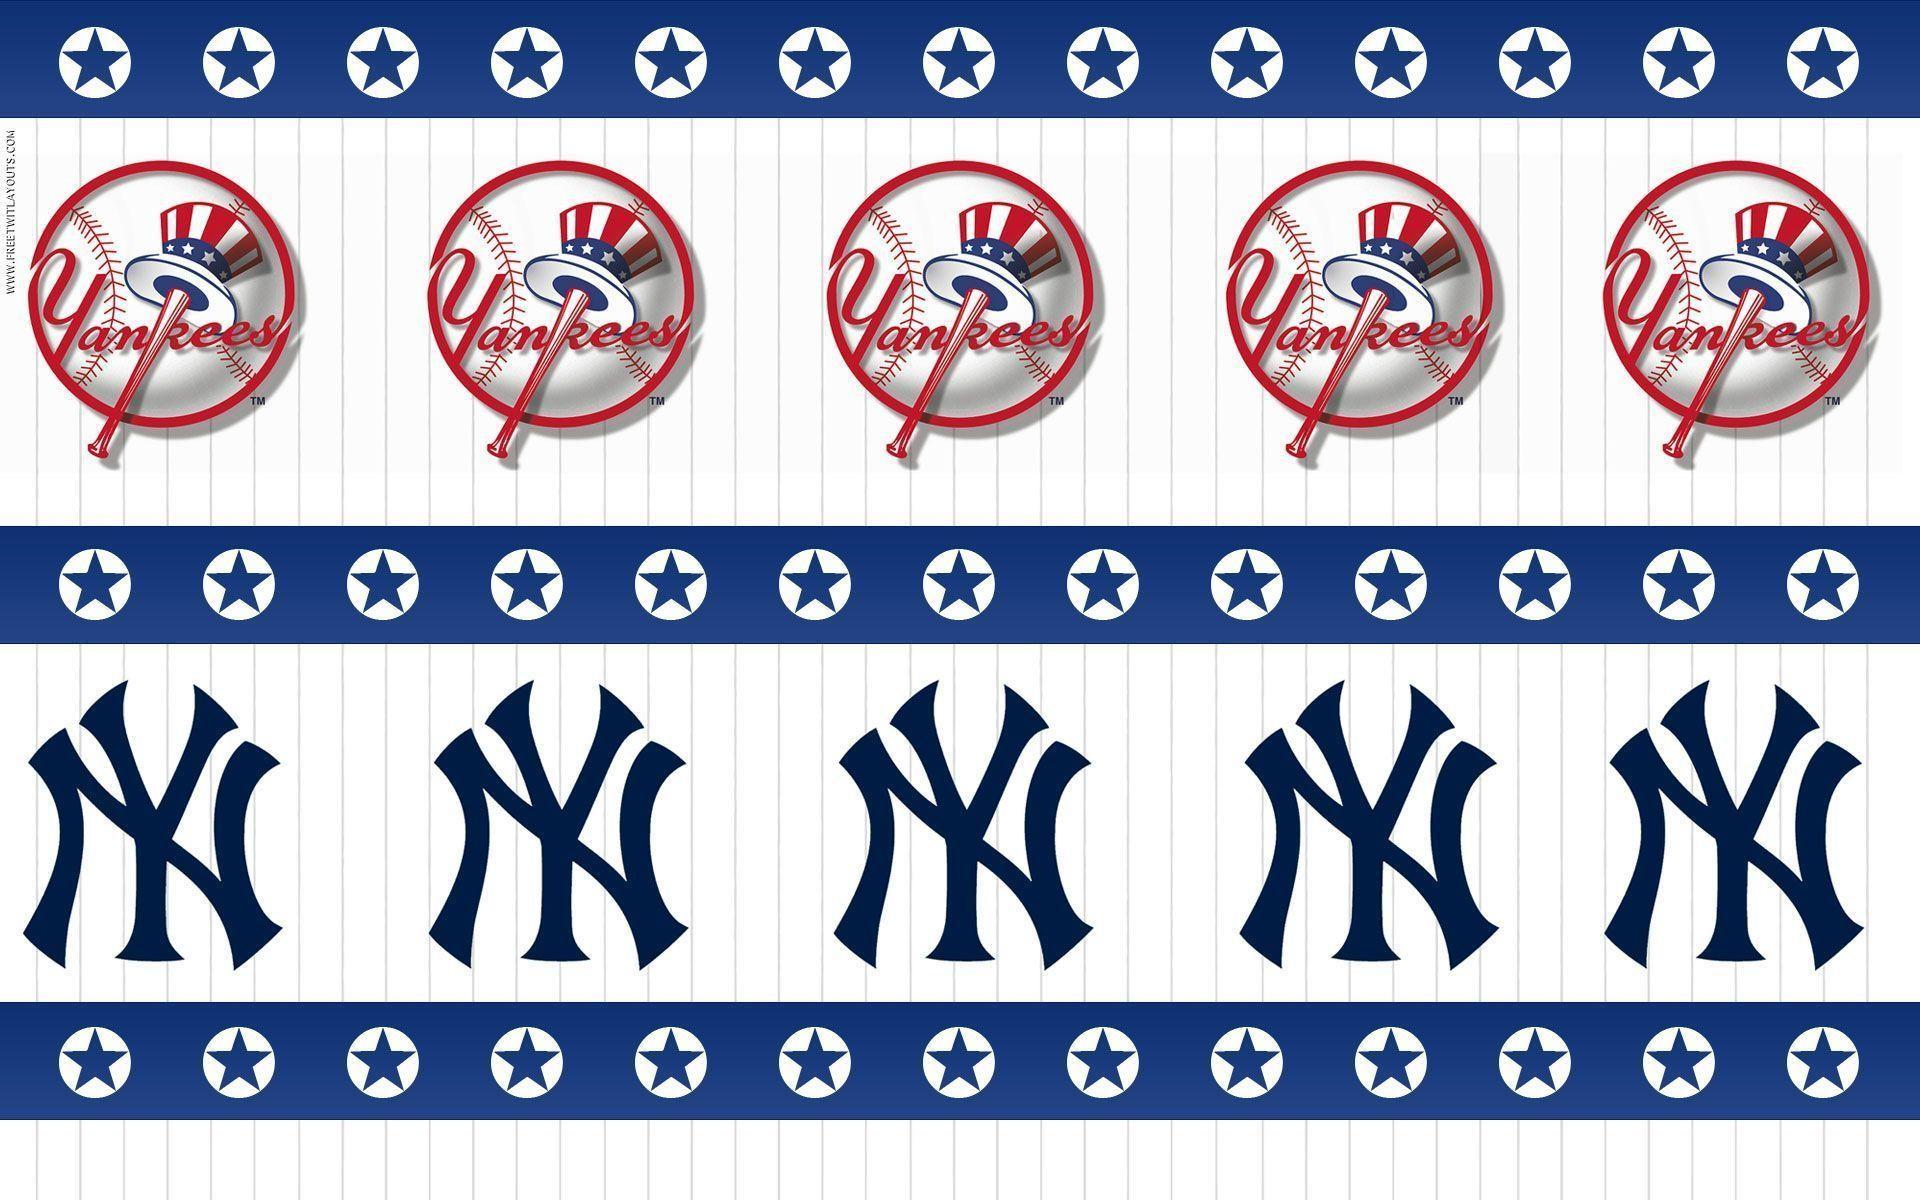 New York Yankees Wallpapers – Full HD wallpaper search